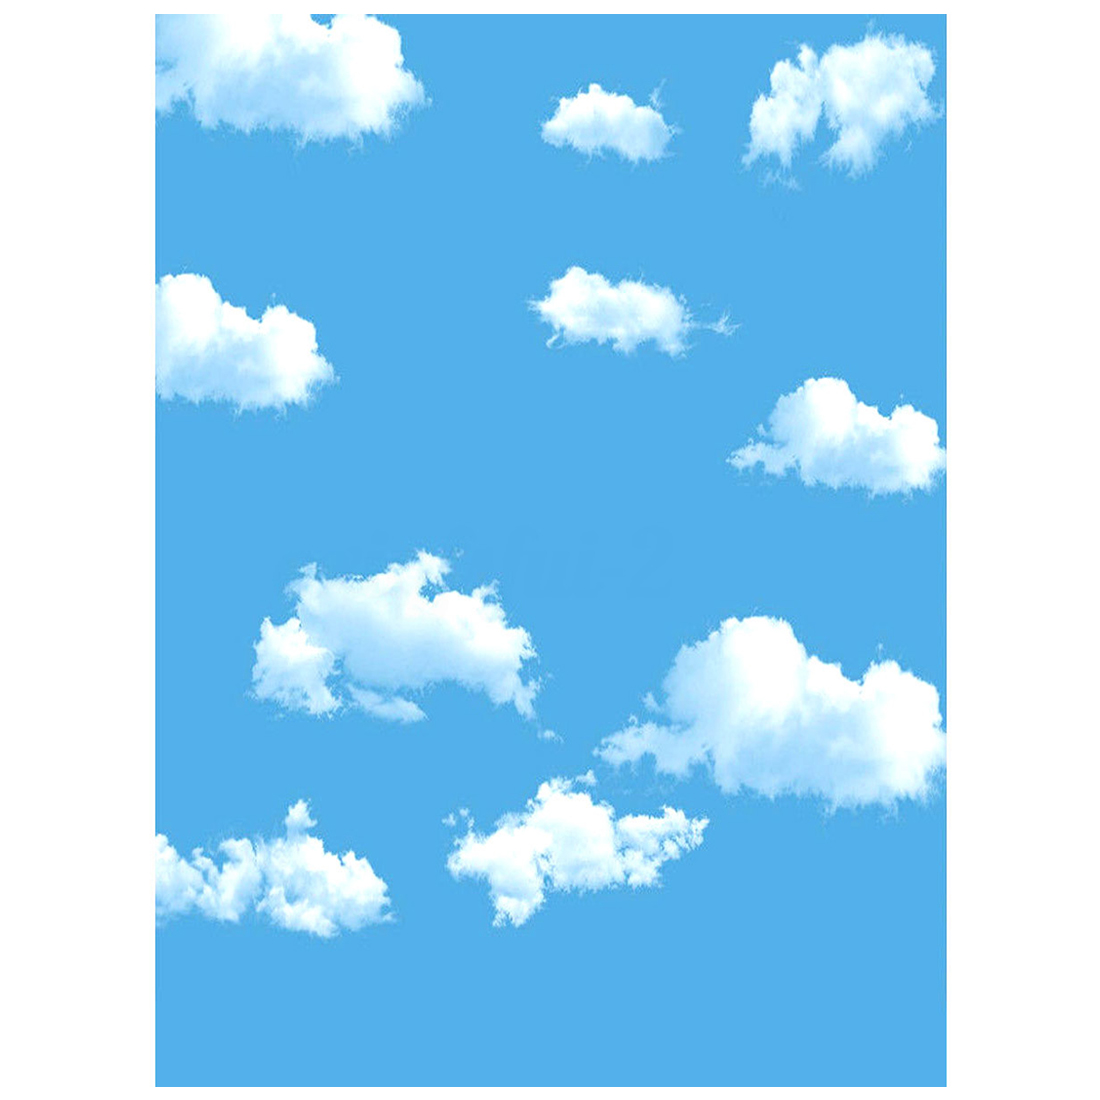 3x5ft Blue Sky White Cloud Photography Backdrop Screen Background Studio Props blue sky чаша северный олень